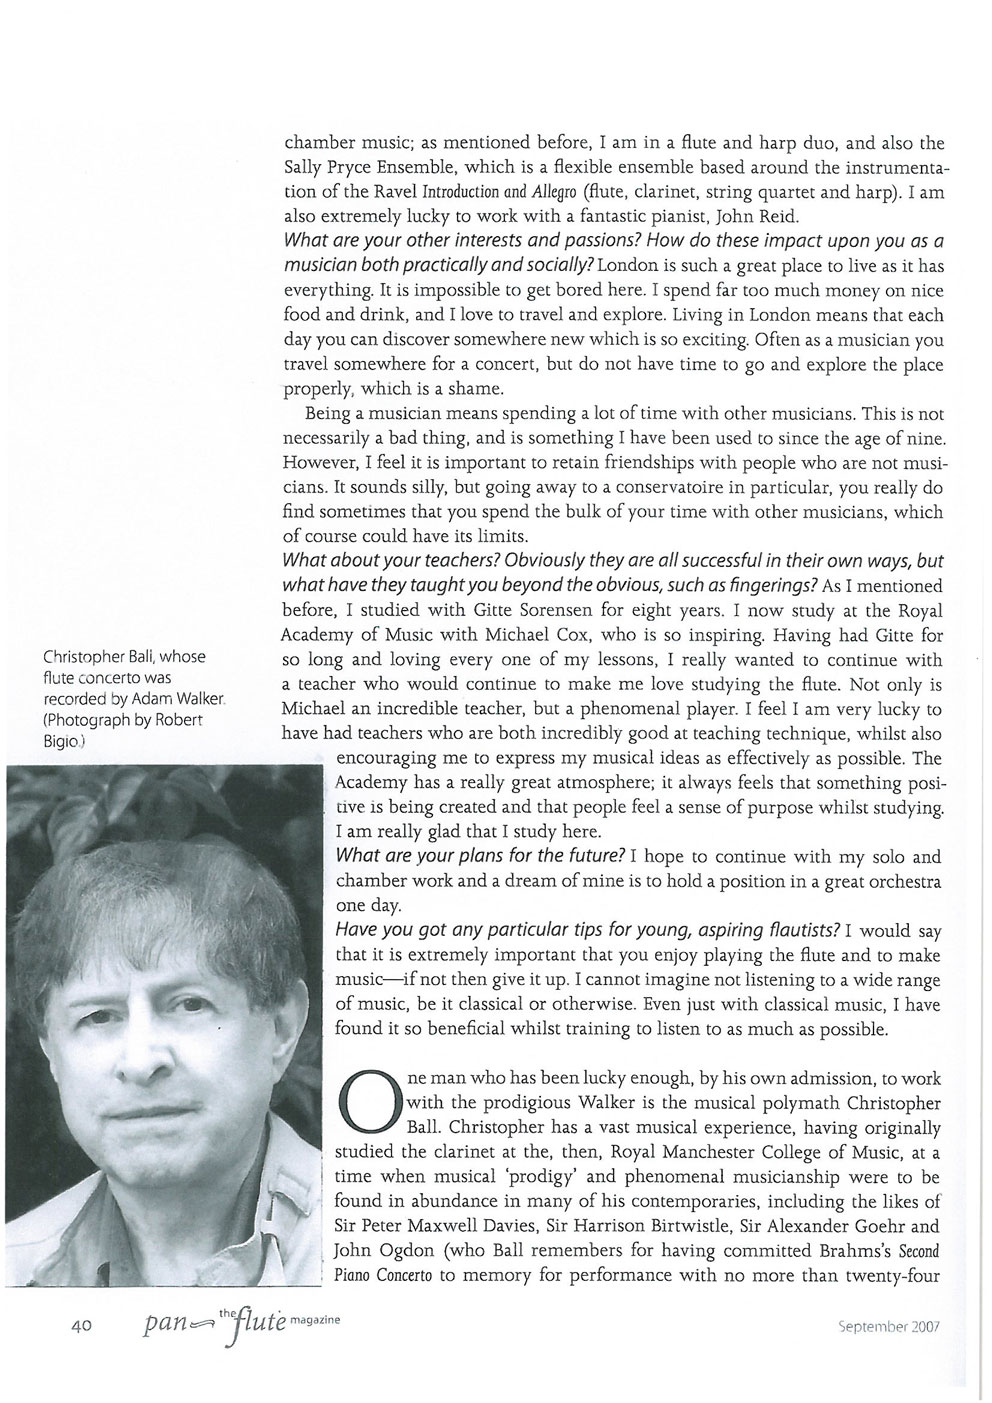 Interview, 2007, Pan, p4